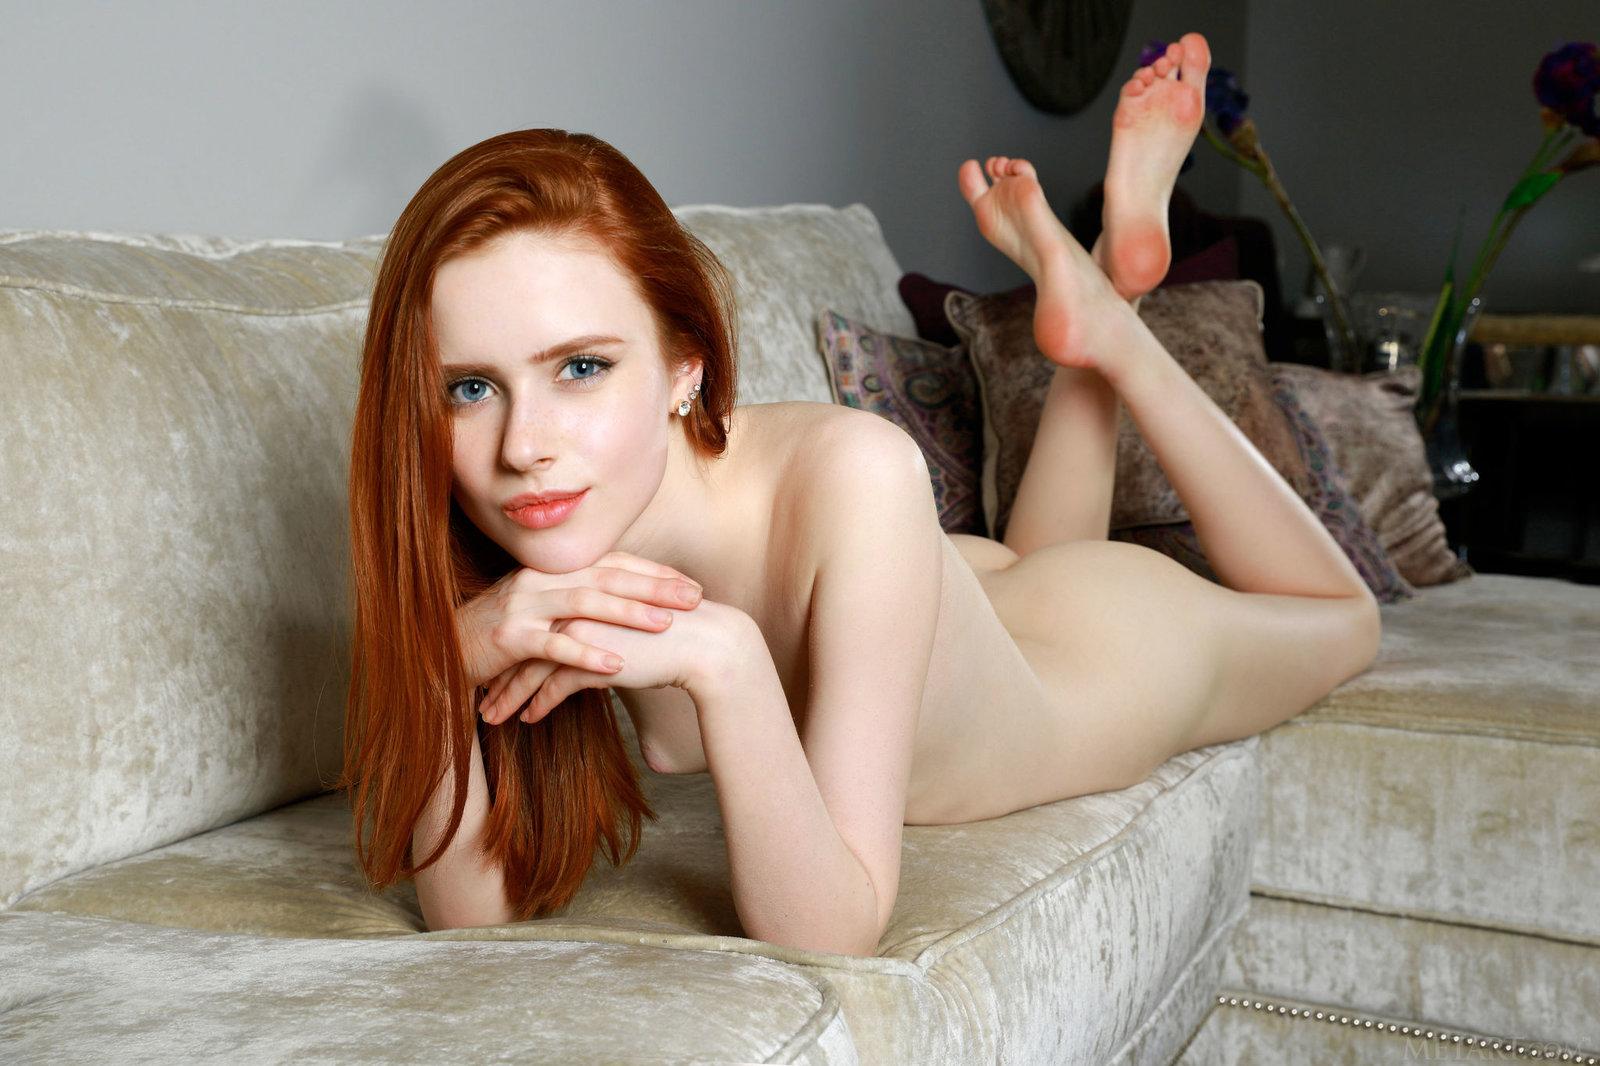 skinny-redhead-long-legs-nude-american-sex-naked-girls-photos